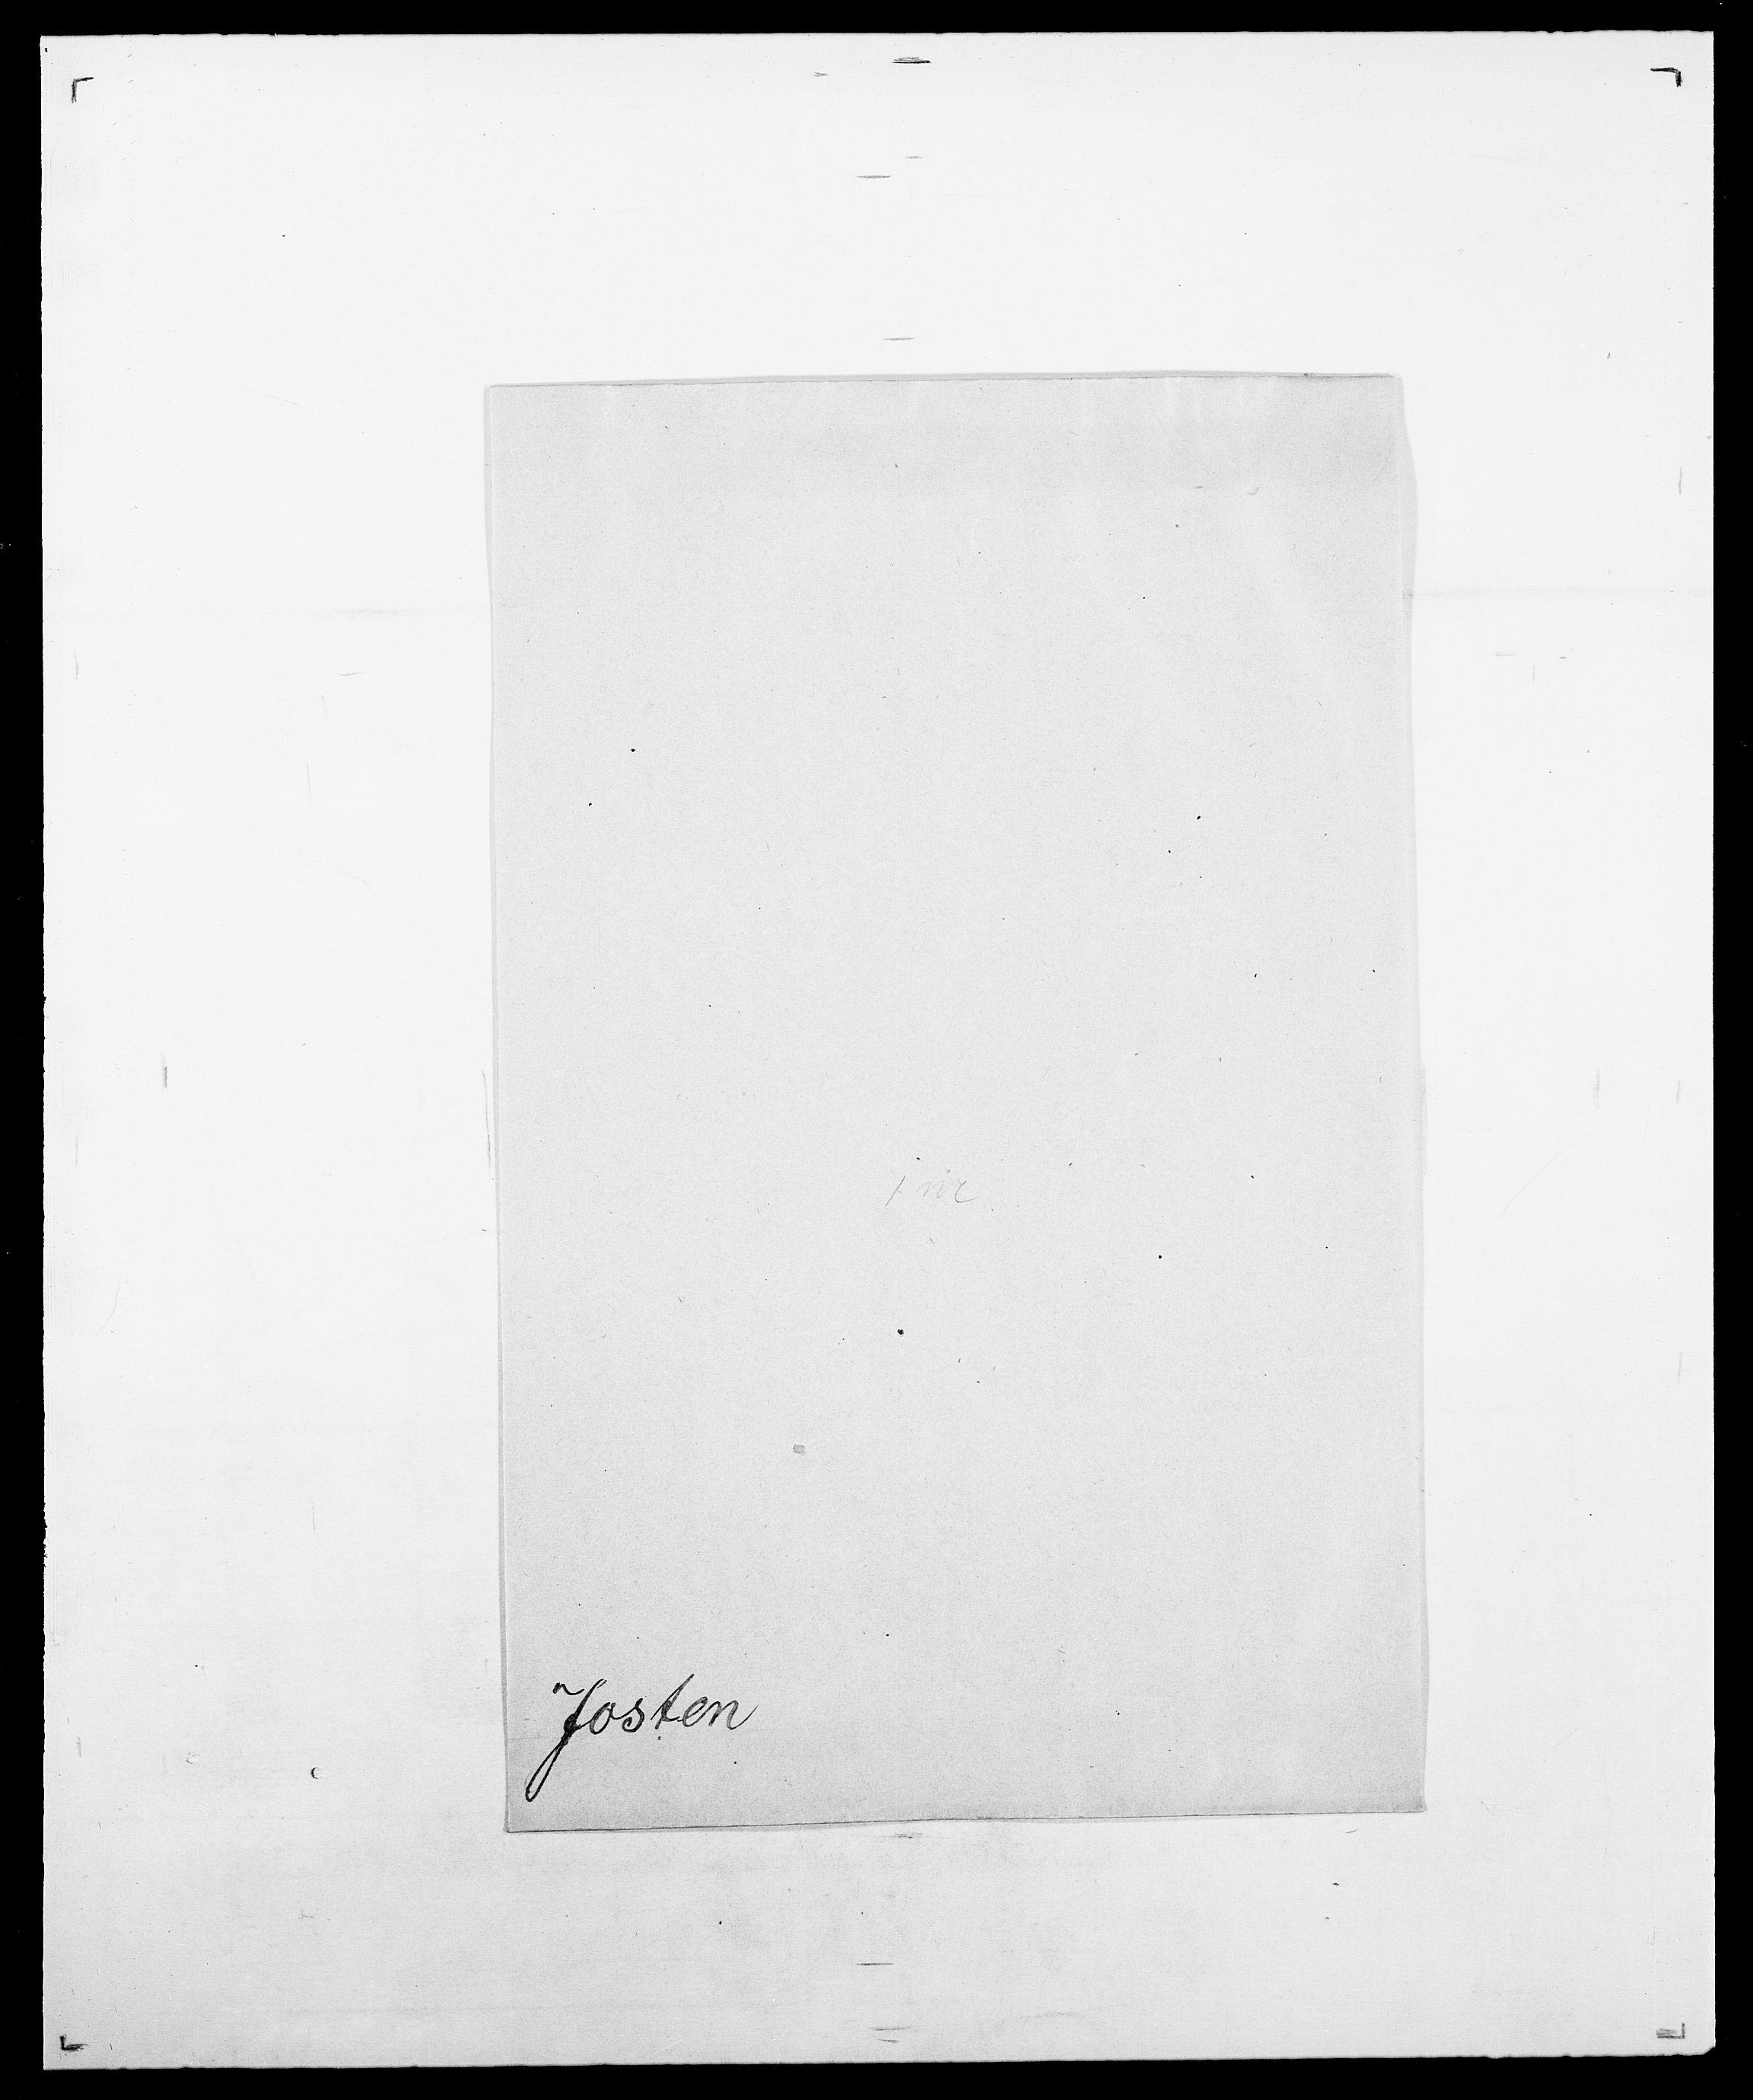 SAO, Delgobe, Charles Antoine - samling, D/Da/L0019: van der Hude - Joys, s. 919